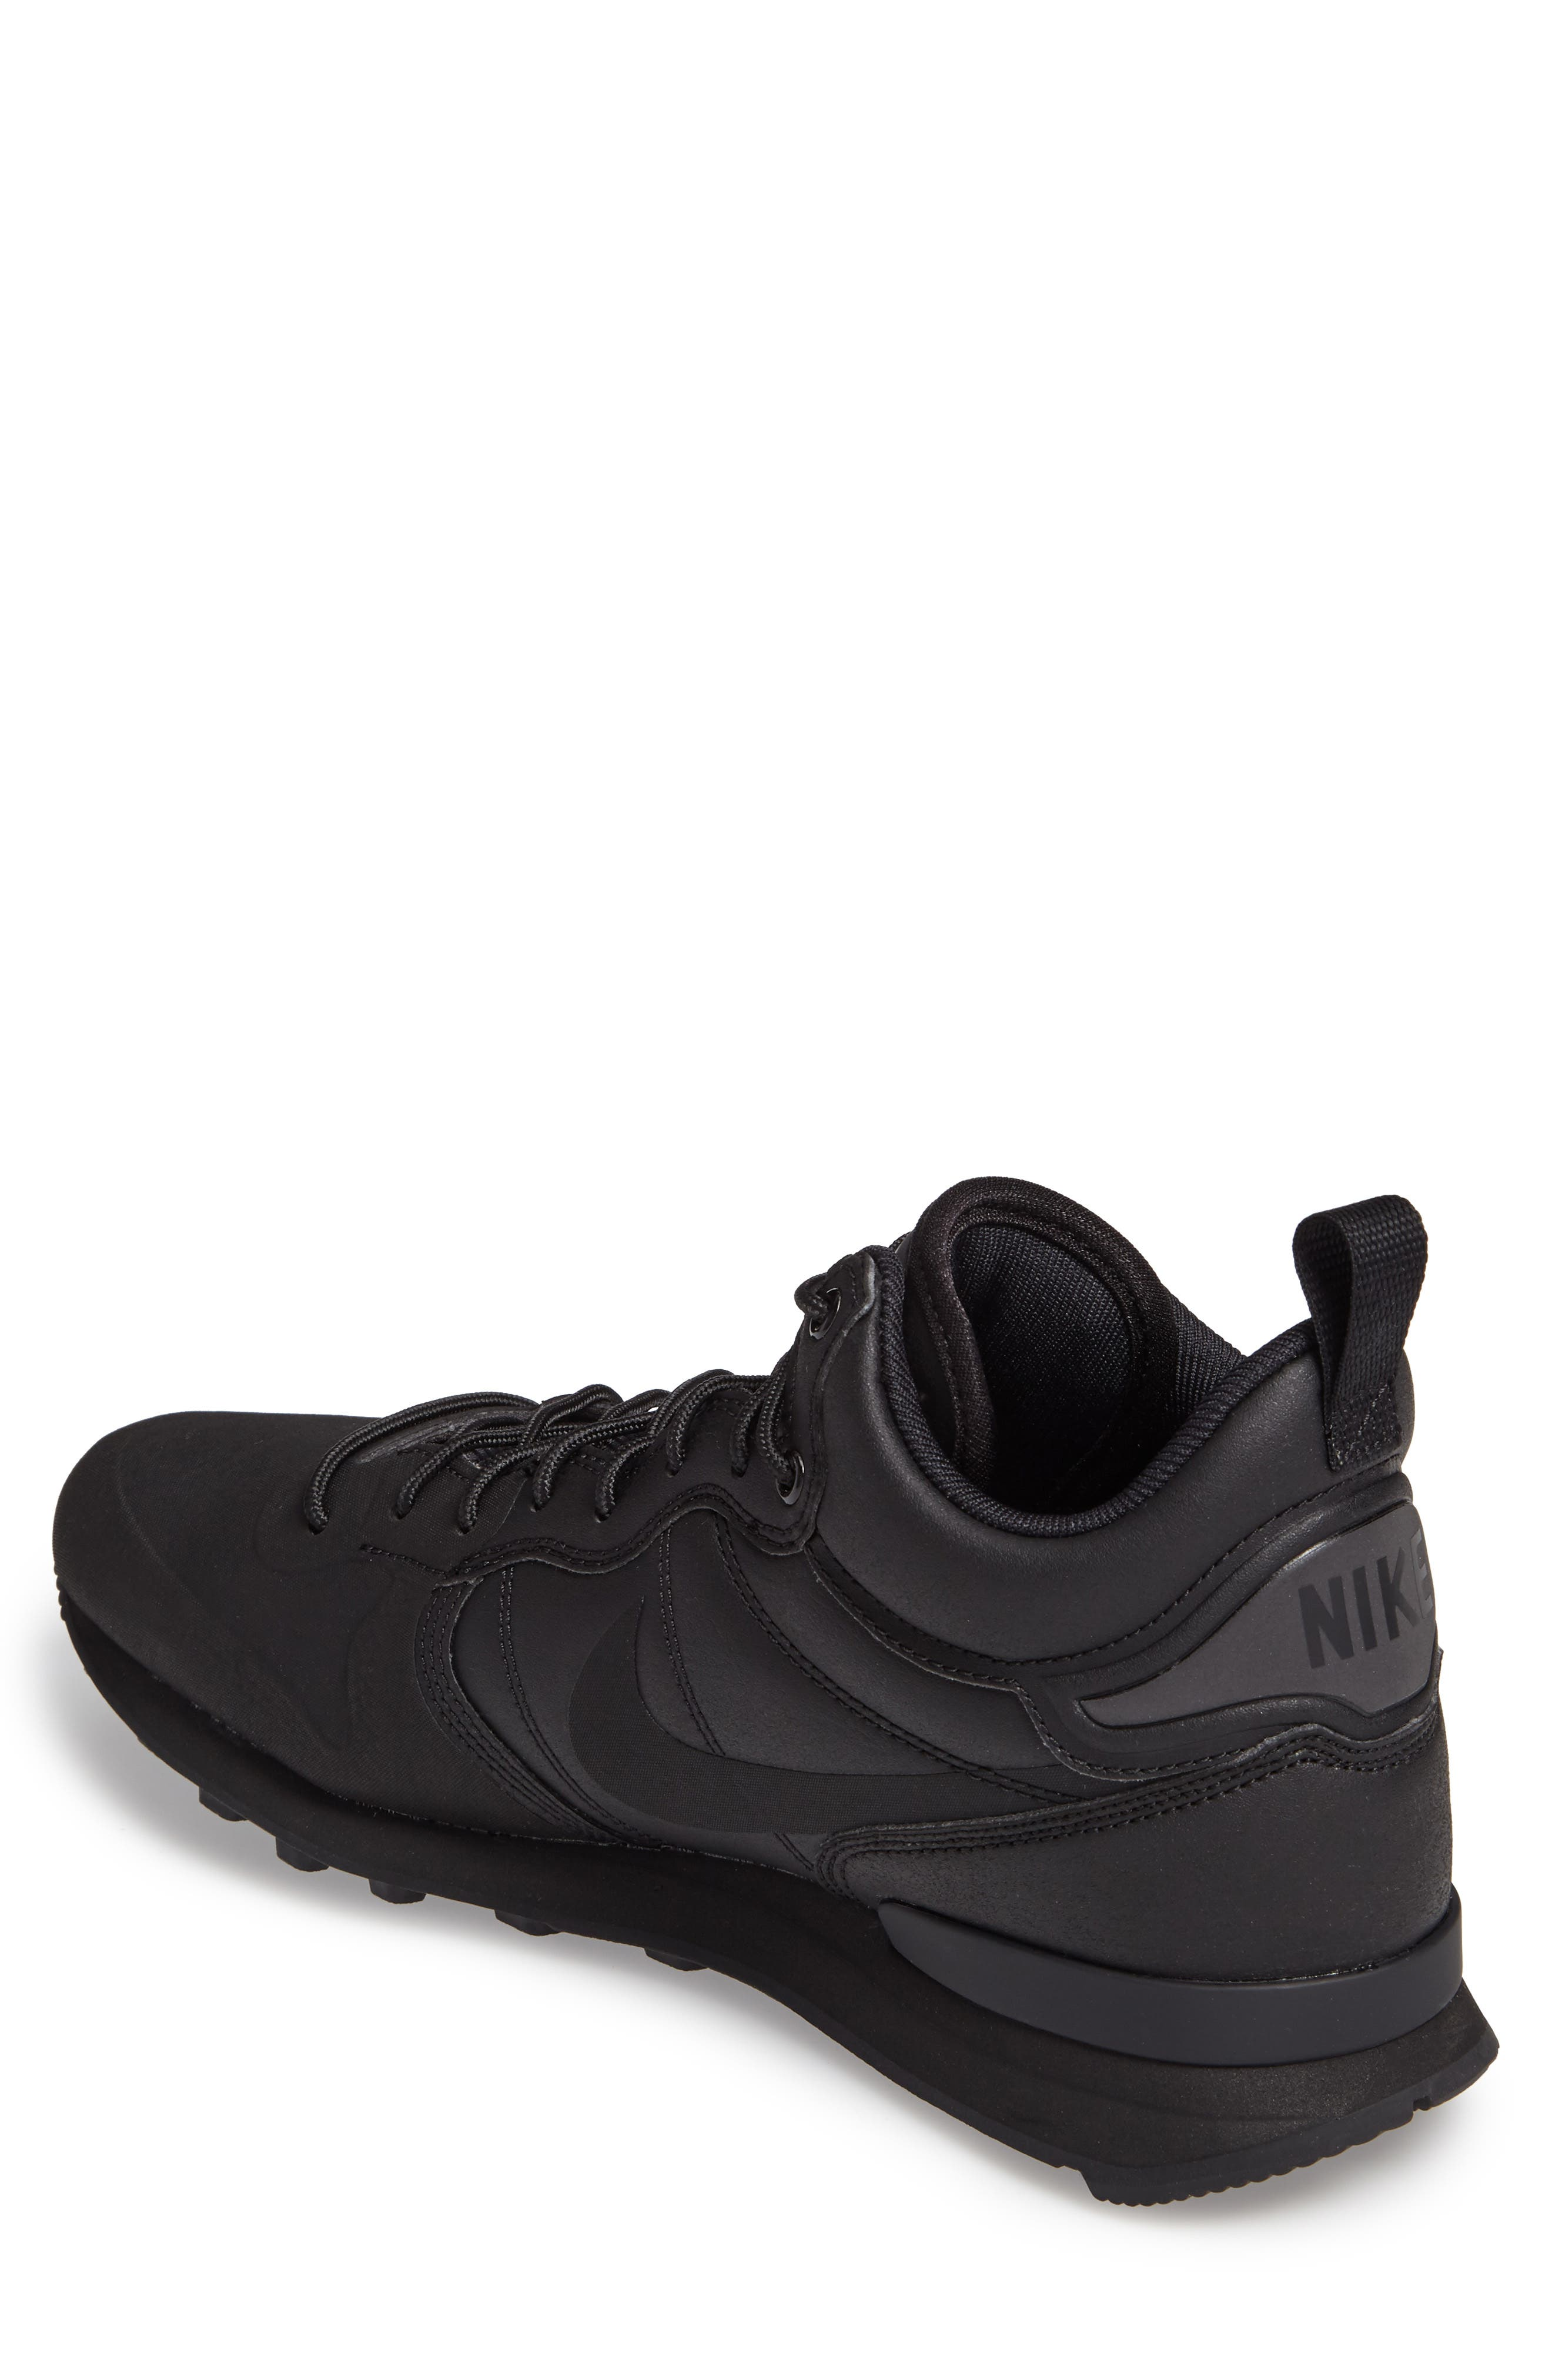 Internationalist Utility Sneaker,                             Alternate thumbnail 2, color,                             001